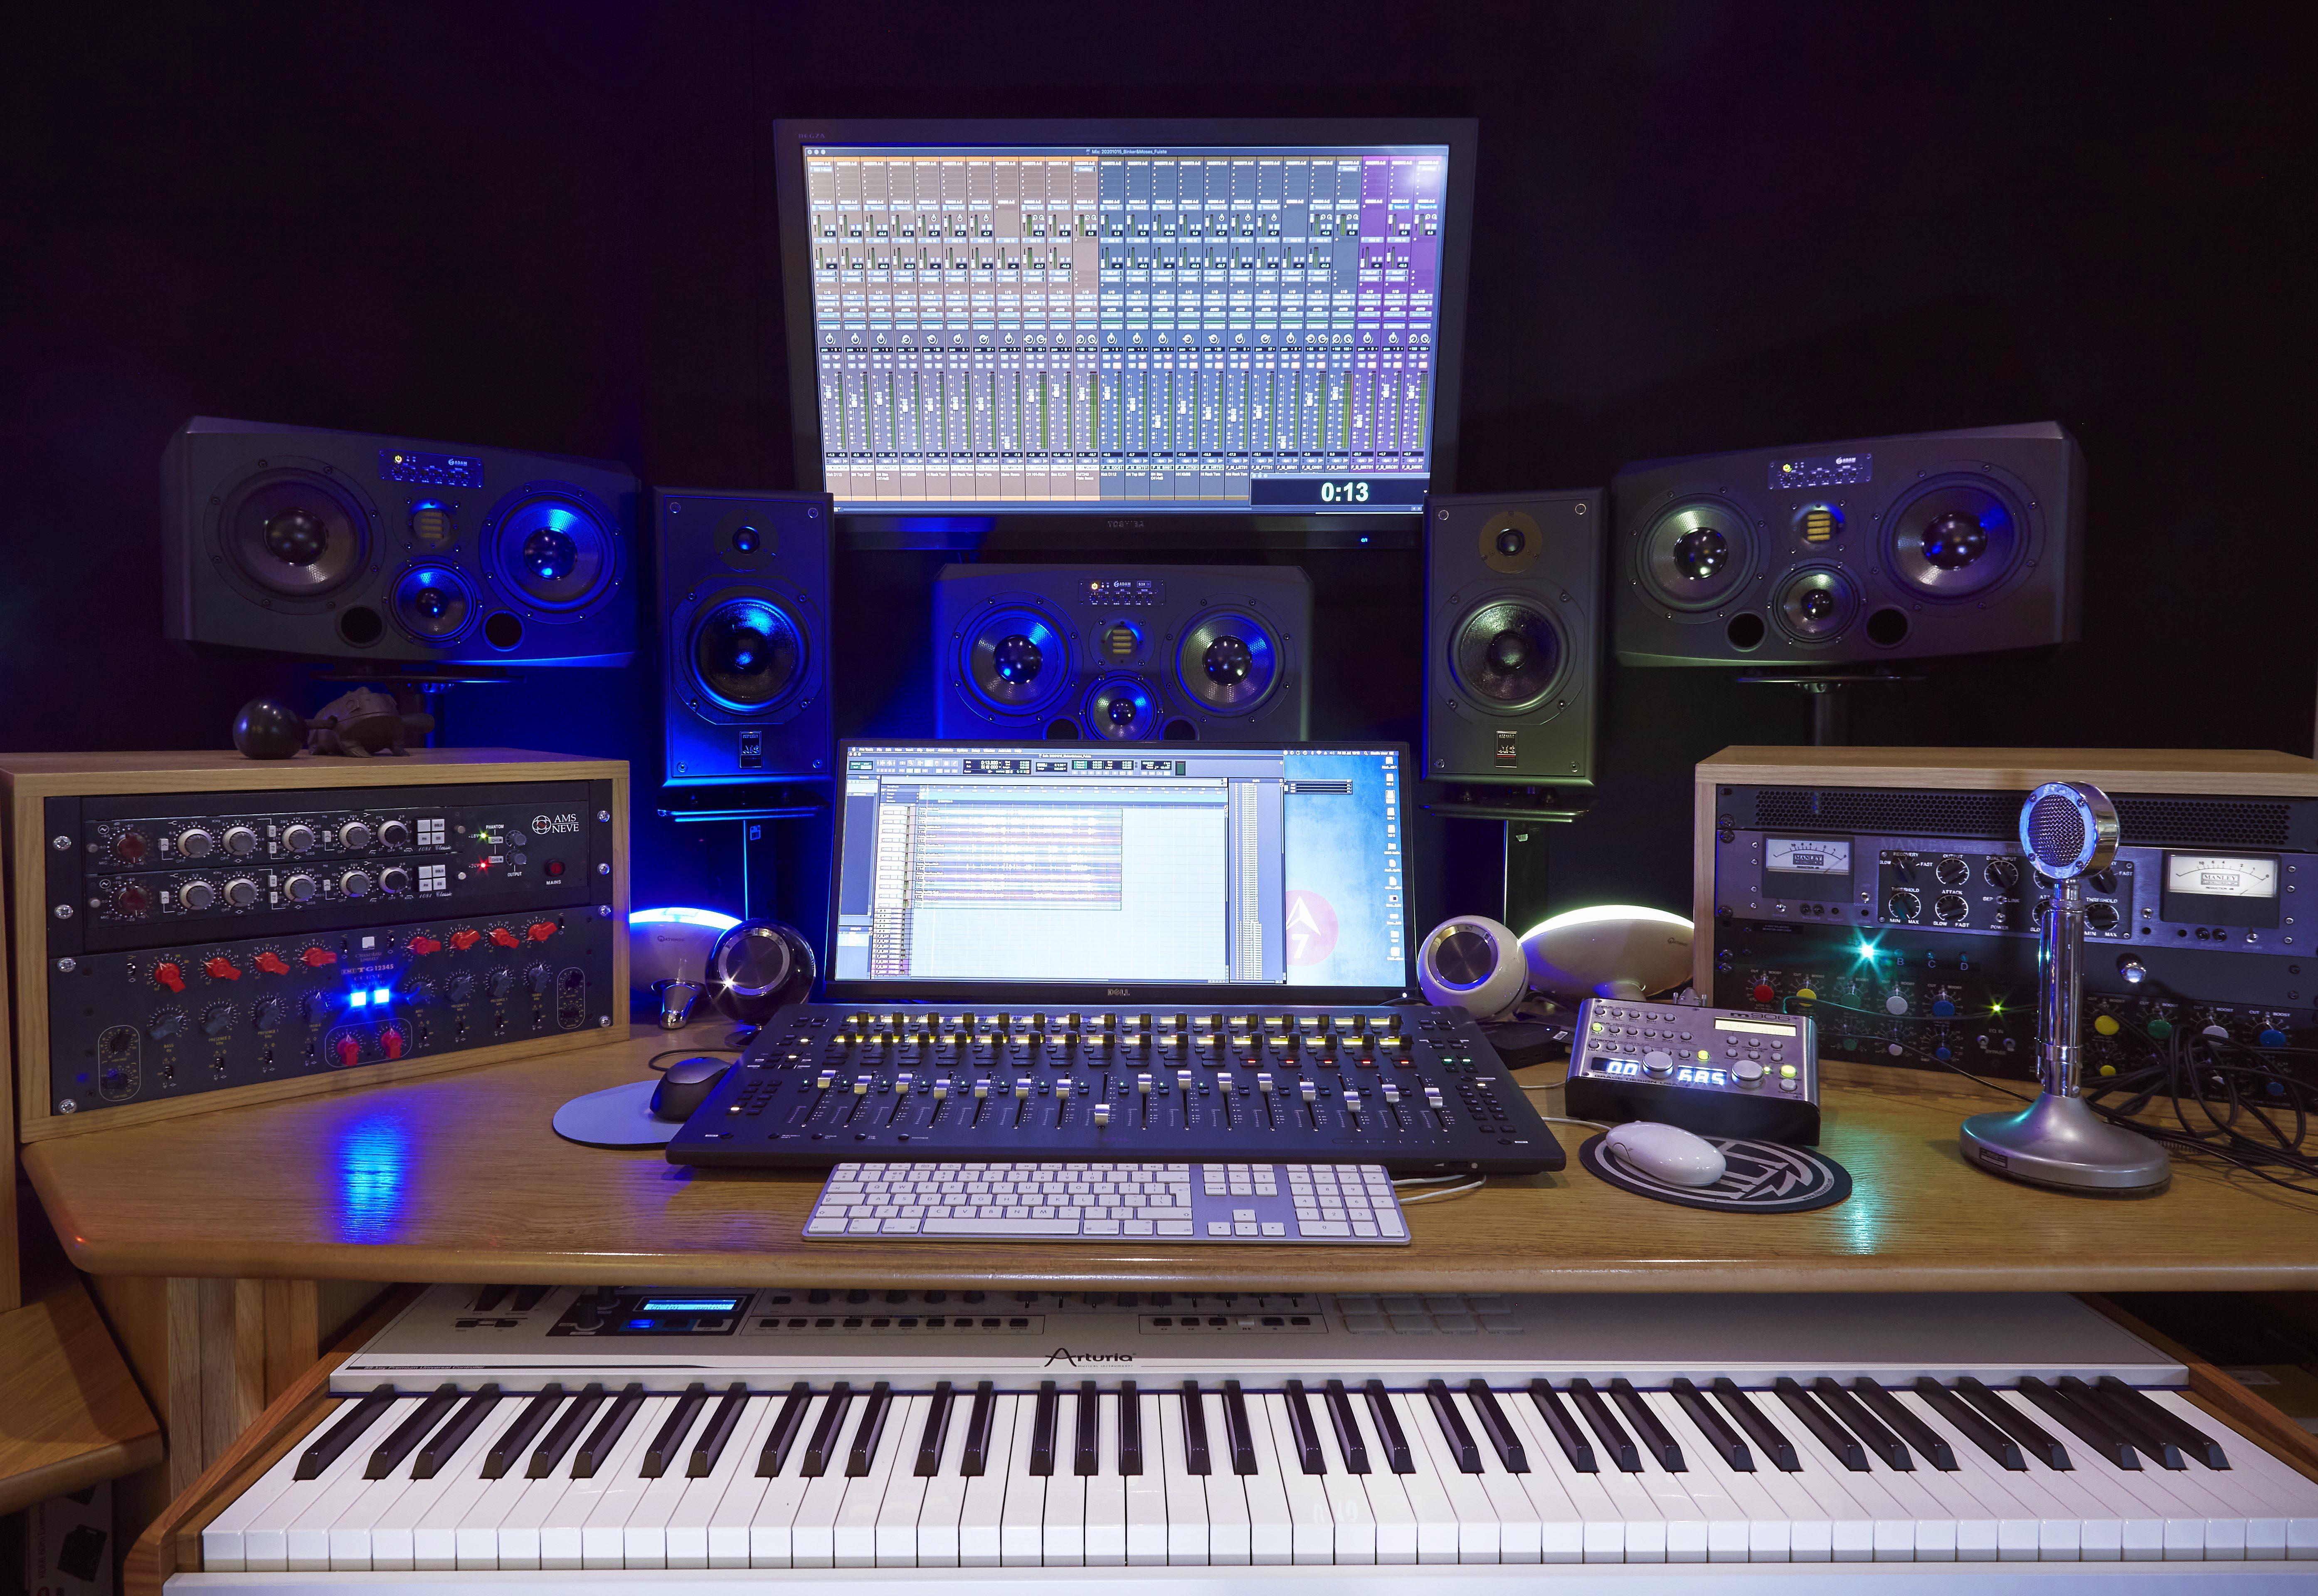 Audio equipment on a desk